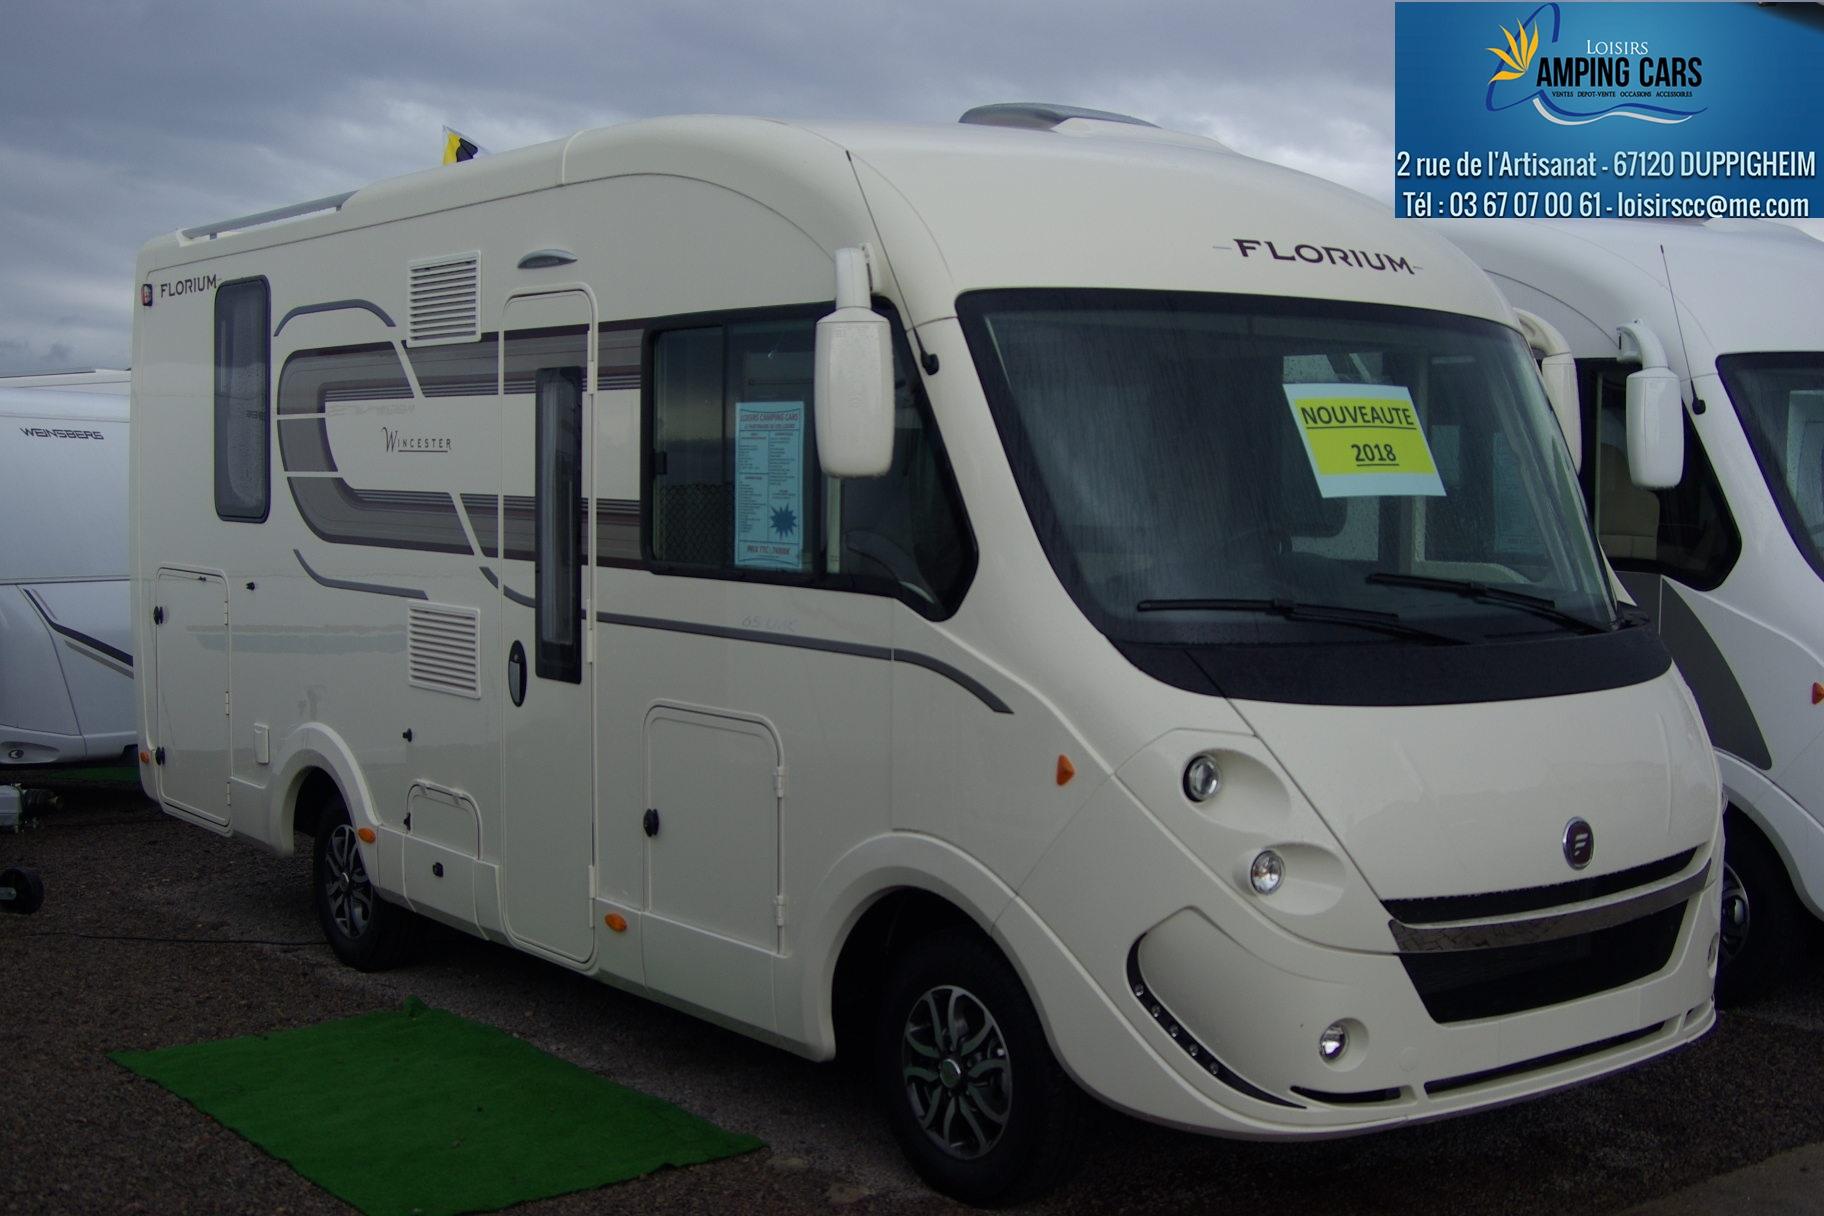 fleurette florium wincester 65lmc neuf de 2018 fiat camping car en vente duppigheim rhin. Black Bedroom Furniture Sets. Home Design Ideas